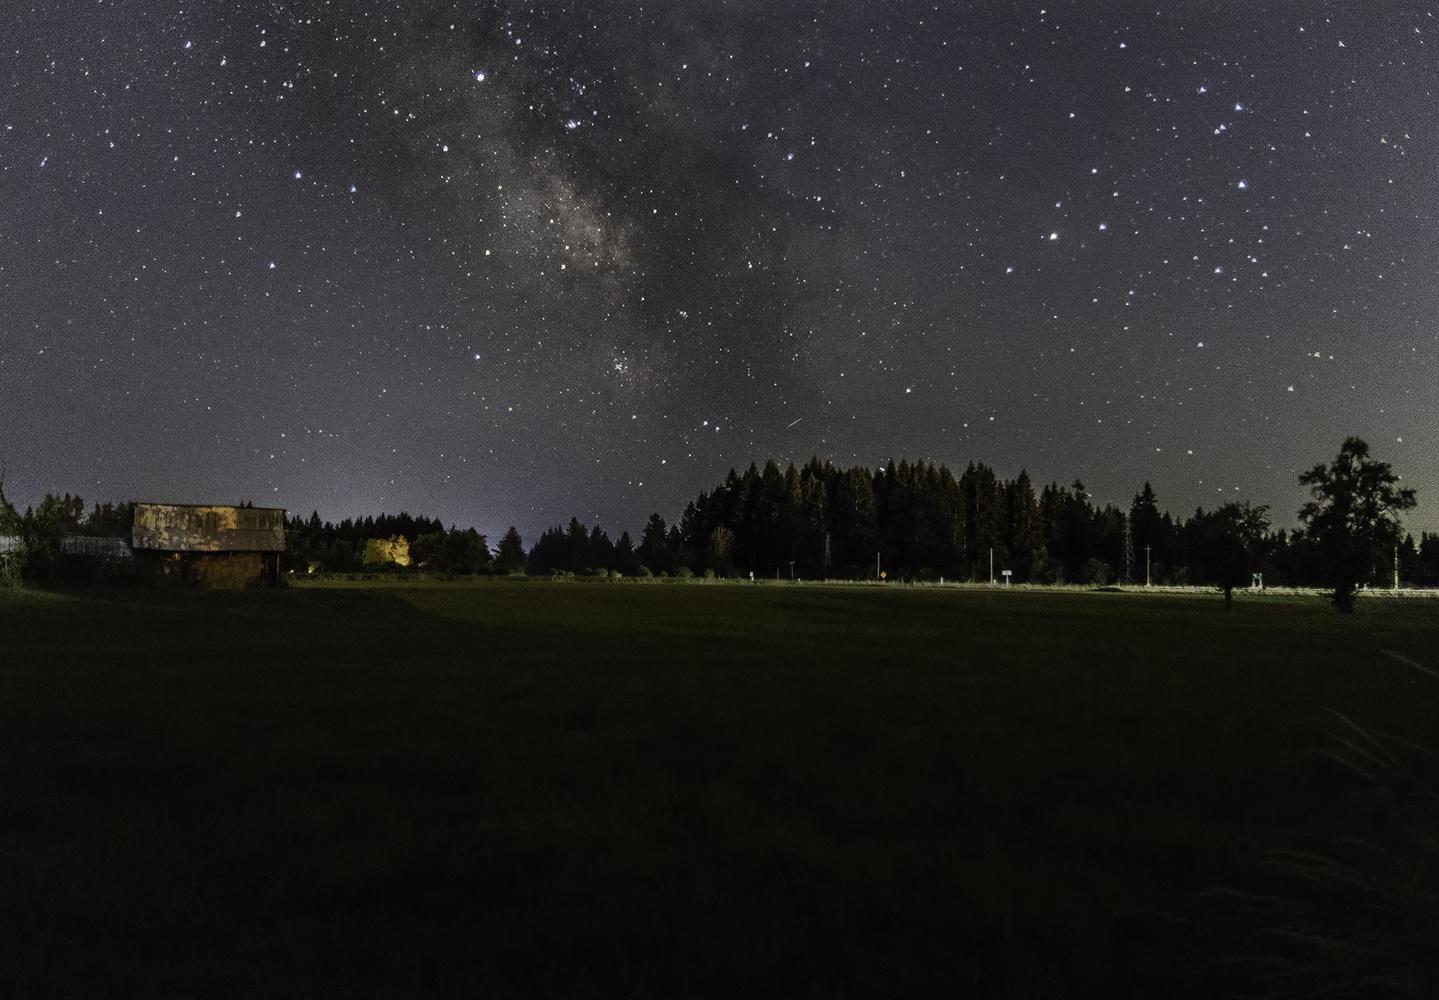 Milkyway2 by Nick Binkley